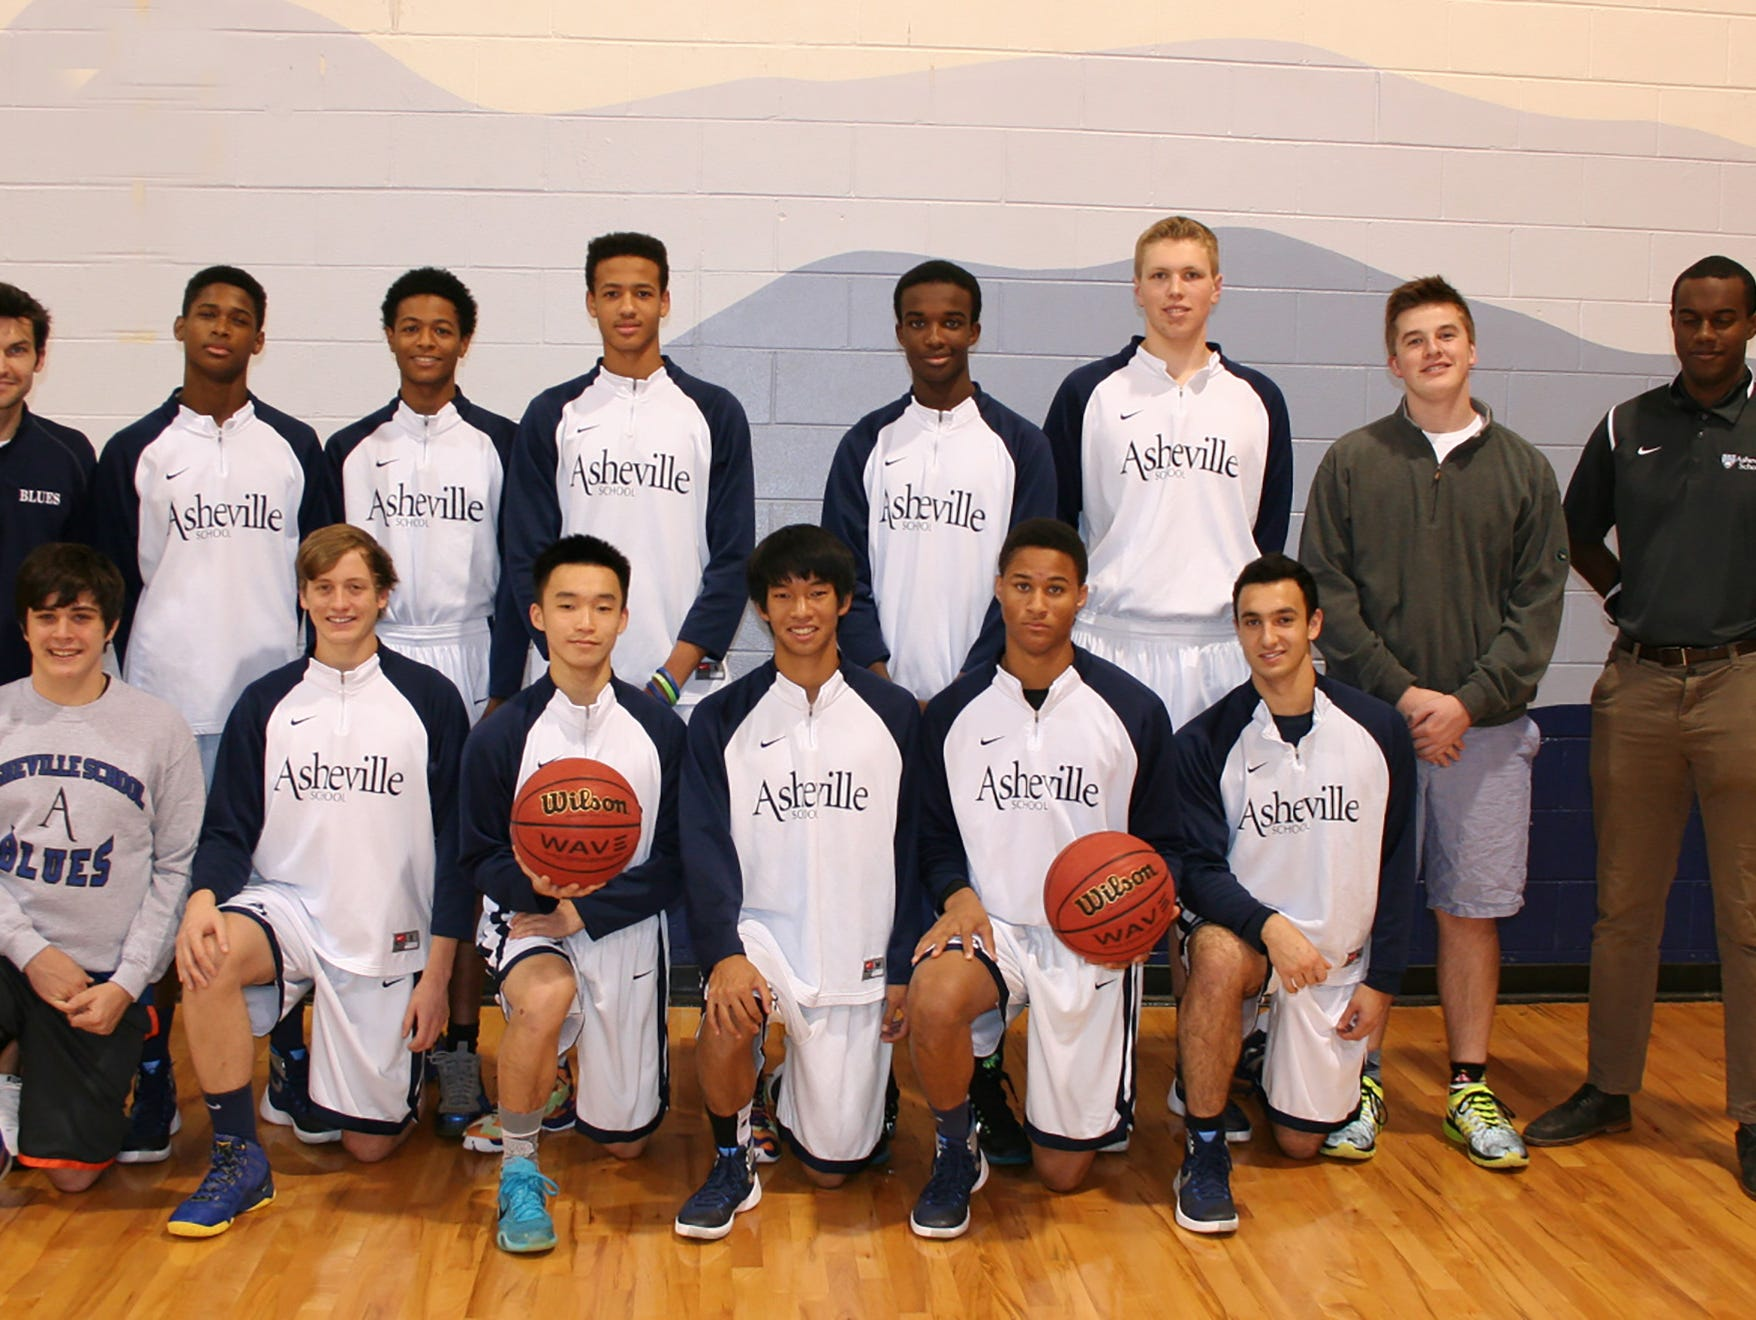 The Asheville School boys basketball team.